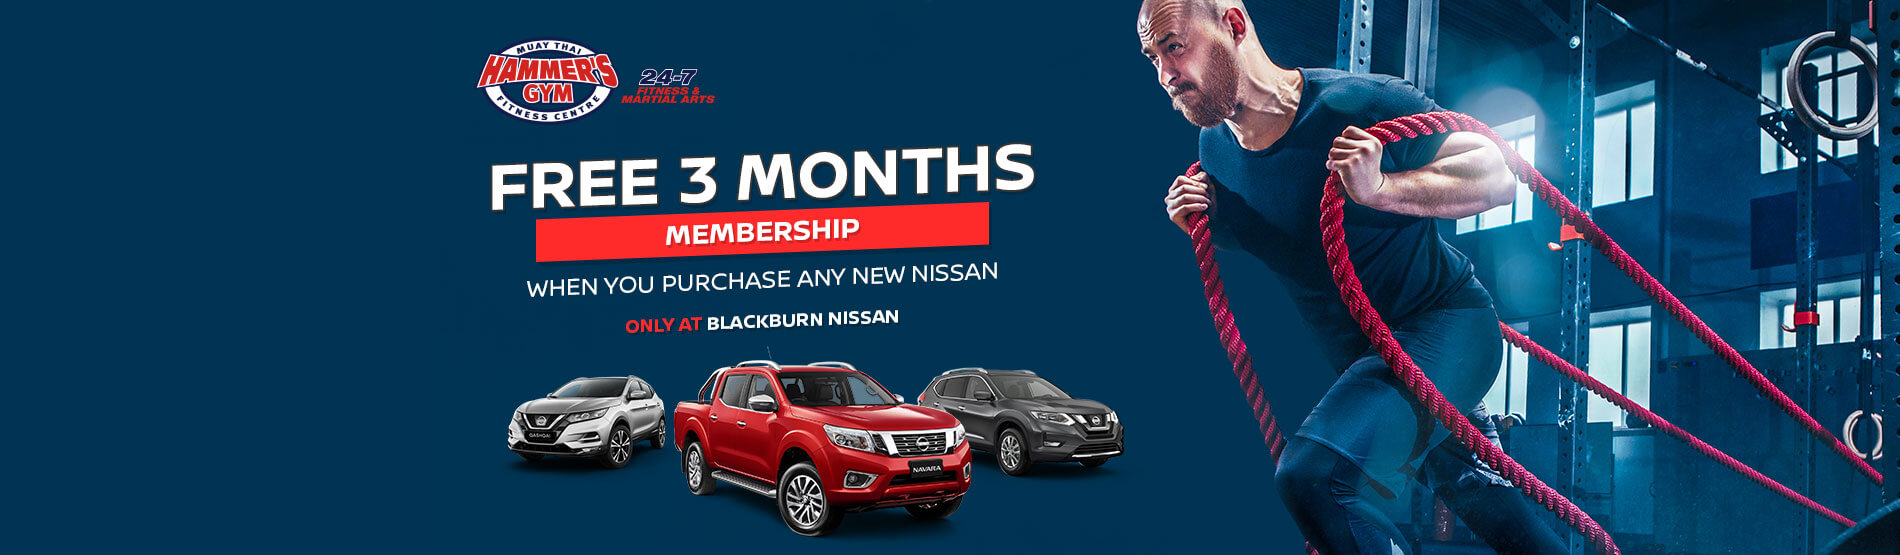 Blackburn Nissan Nissan Dealer Blackburn